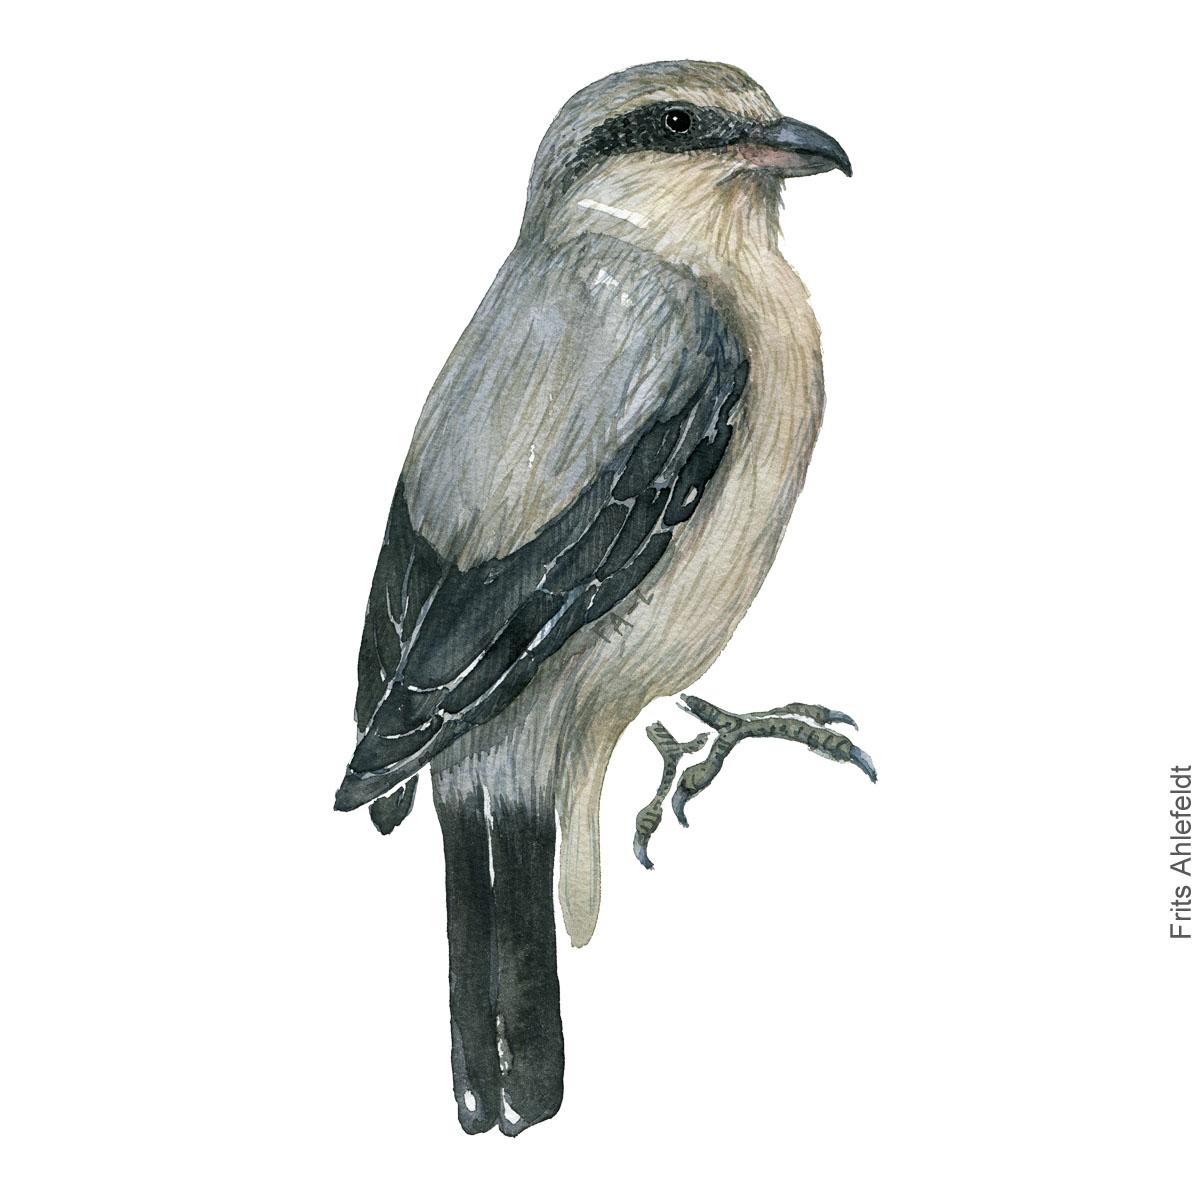 Stor tornskade - Great grey shrike - Bird painting in watercolor by Frits Ahlefeldt - Fugle akvarel